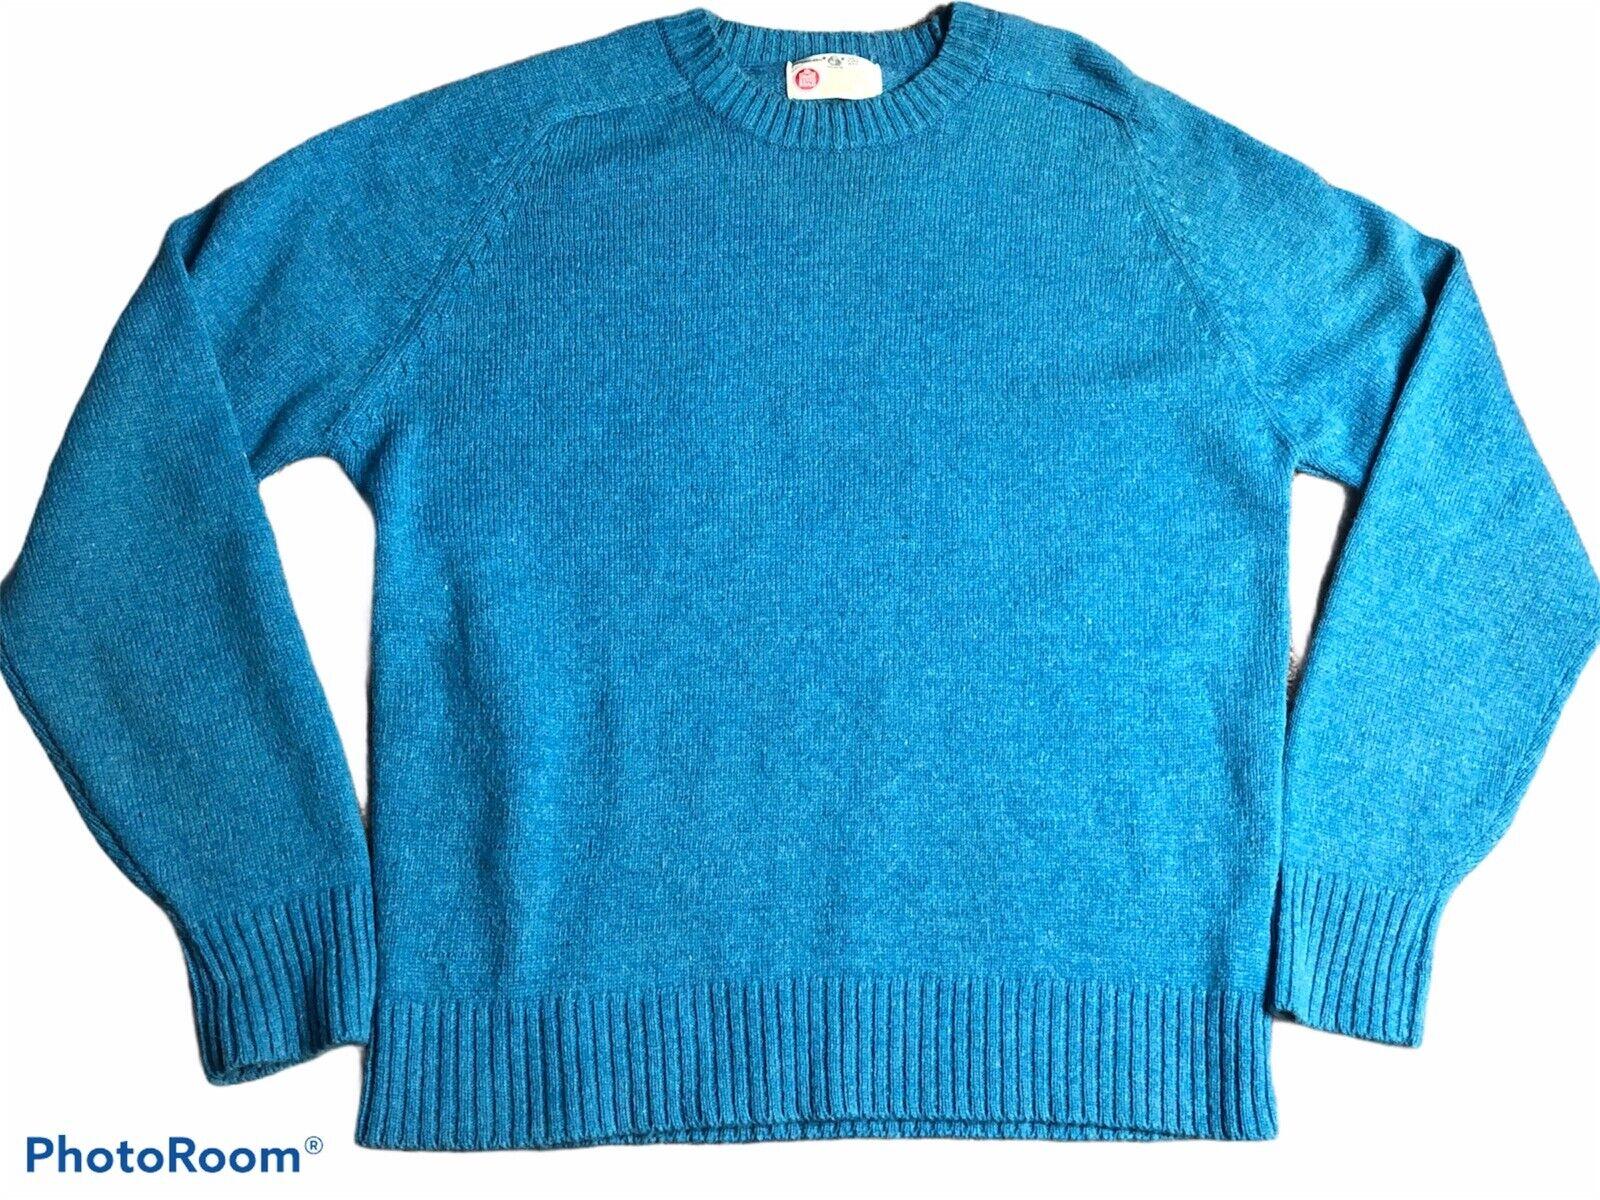 Vintage Kings Road 100% Pure Wool Sweater Sears 70s 80s XL (H3)